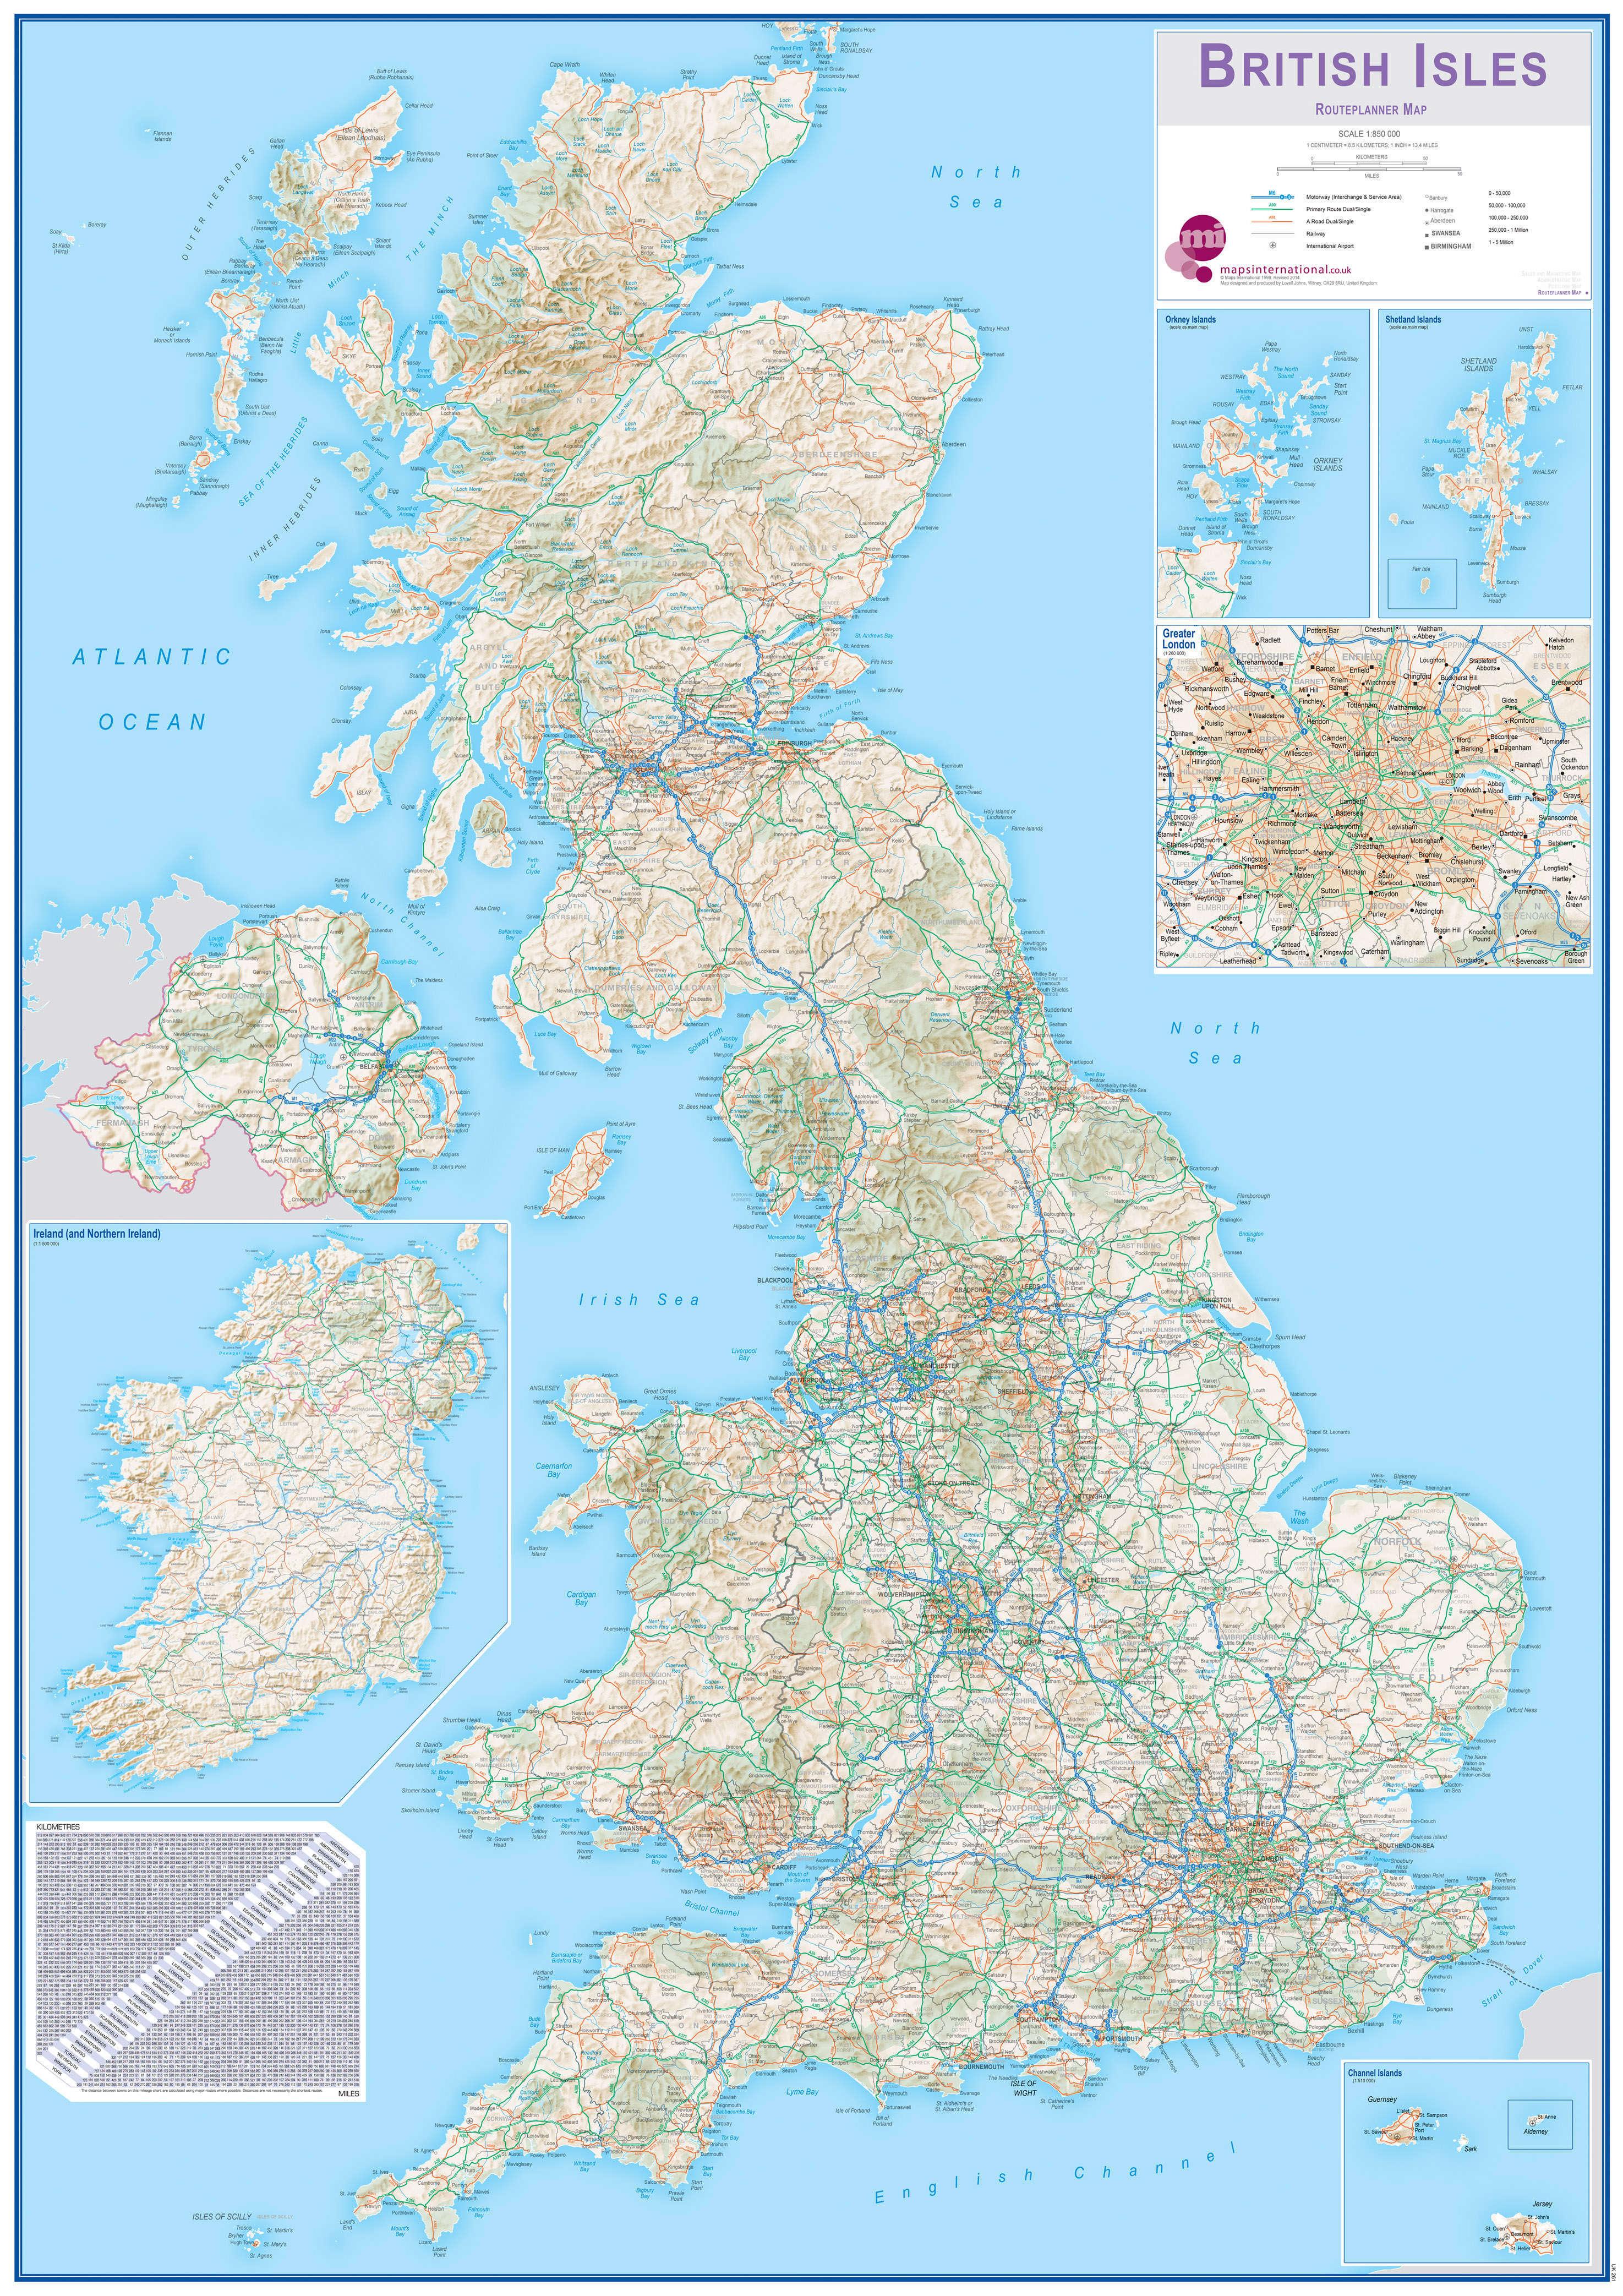 Large British Isles Routeplanning Map (Laminated) | 84.1cm (w) x 118.9cm (h)